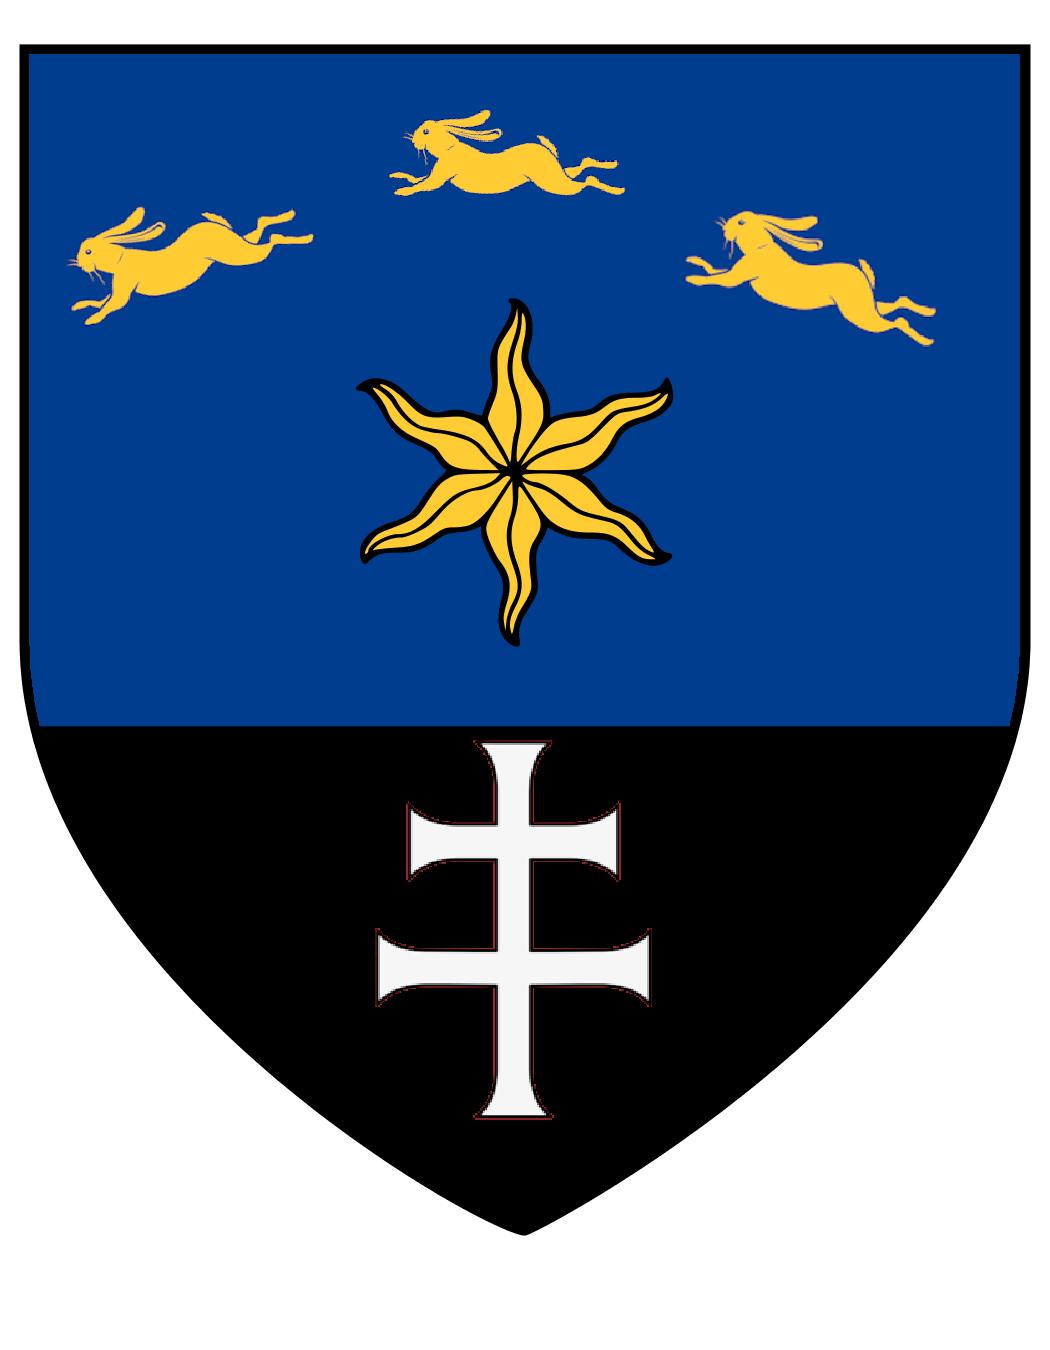 coat_of_arms_Matthias_von_Nitra_1.png